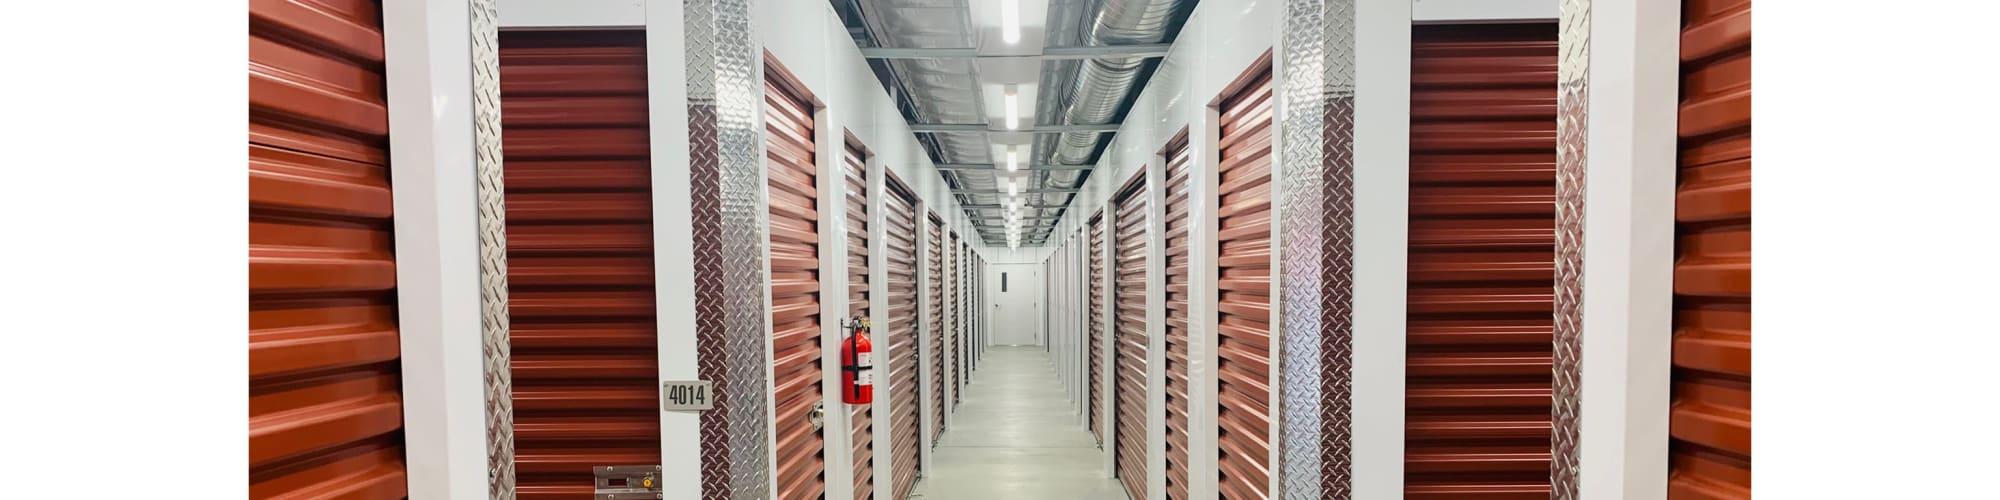 Temperature Controlled Storage In South Jordan Ut Near Sandy